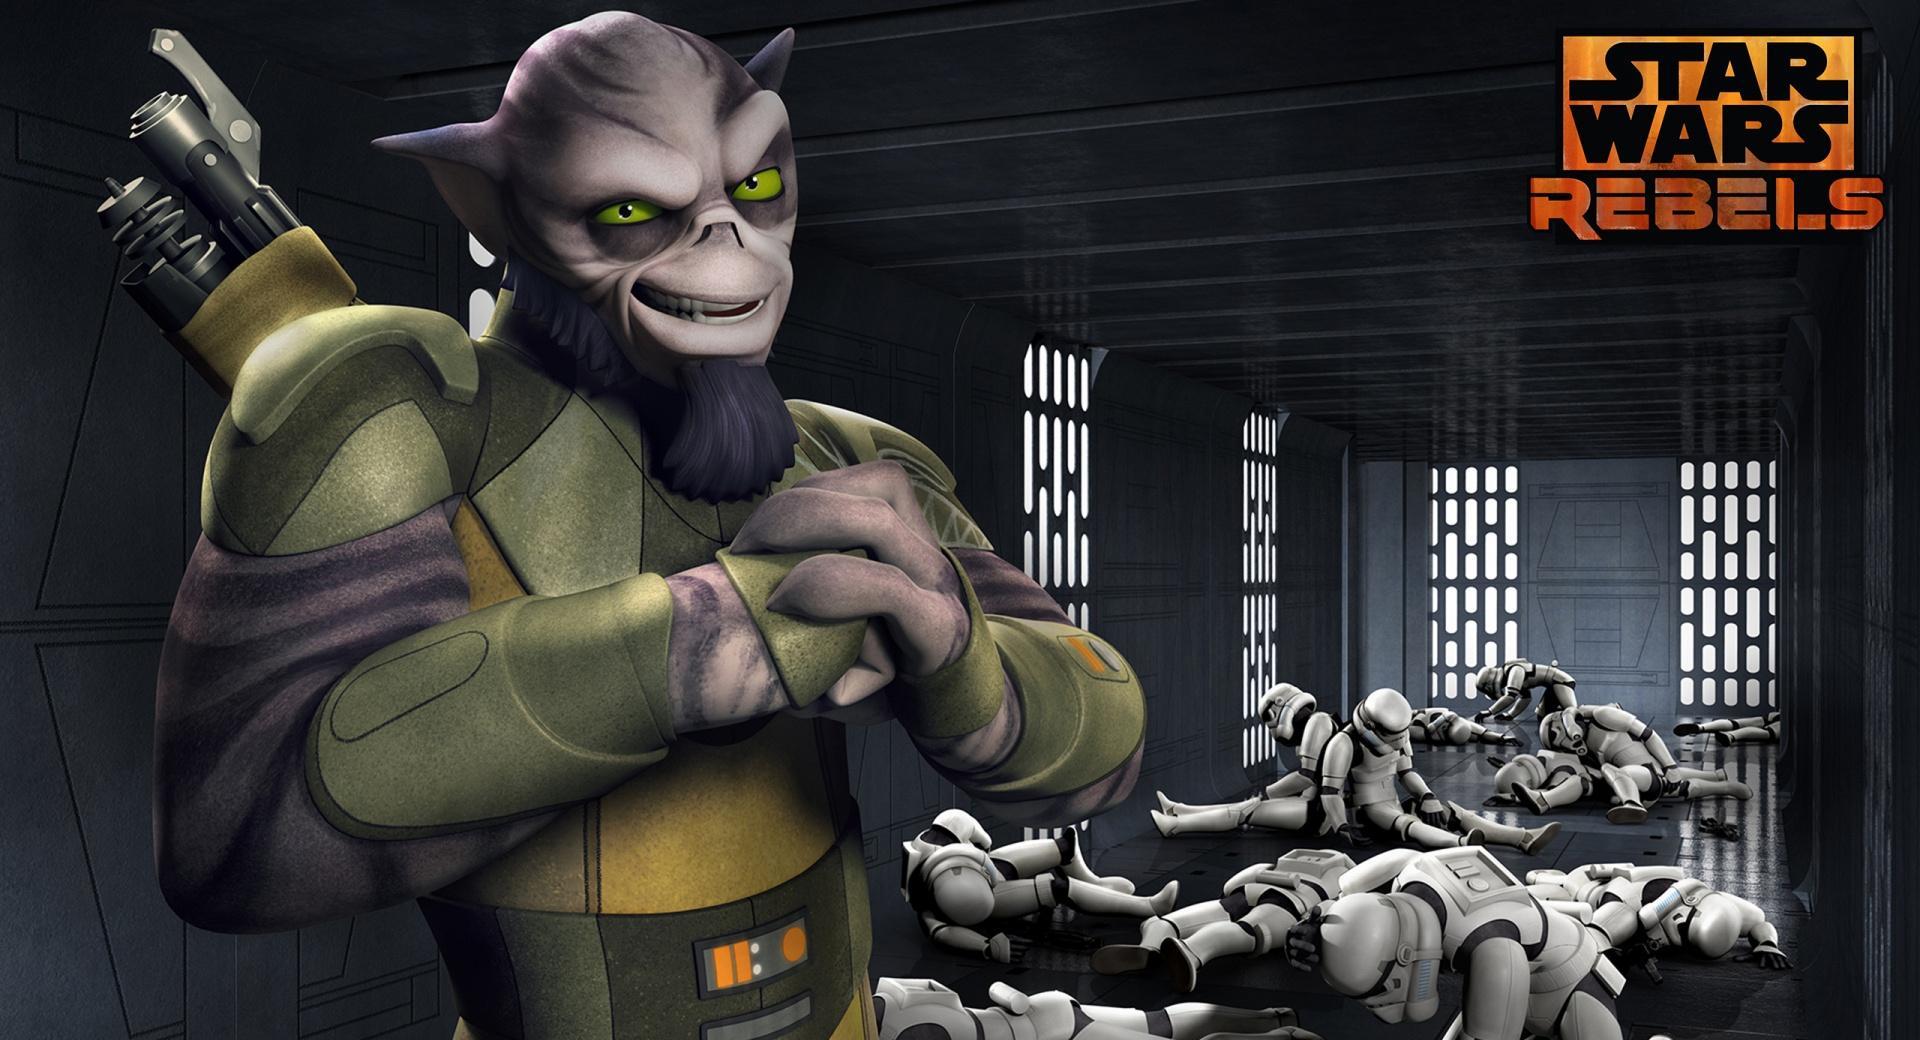 Star Wars Rebels Zeb wallpapers HD quality